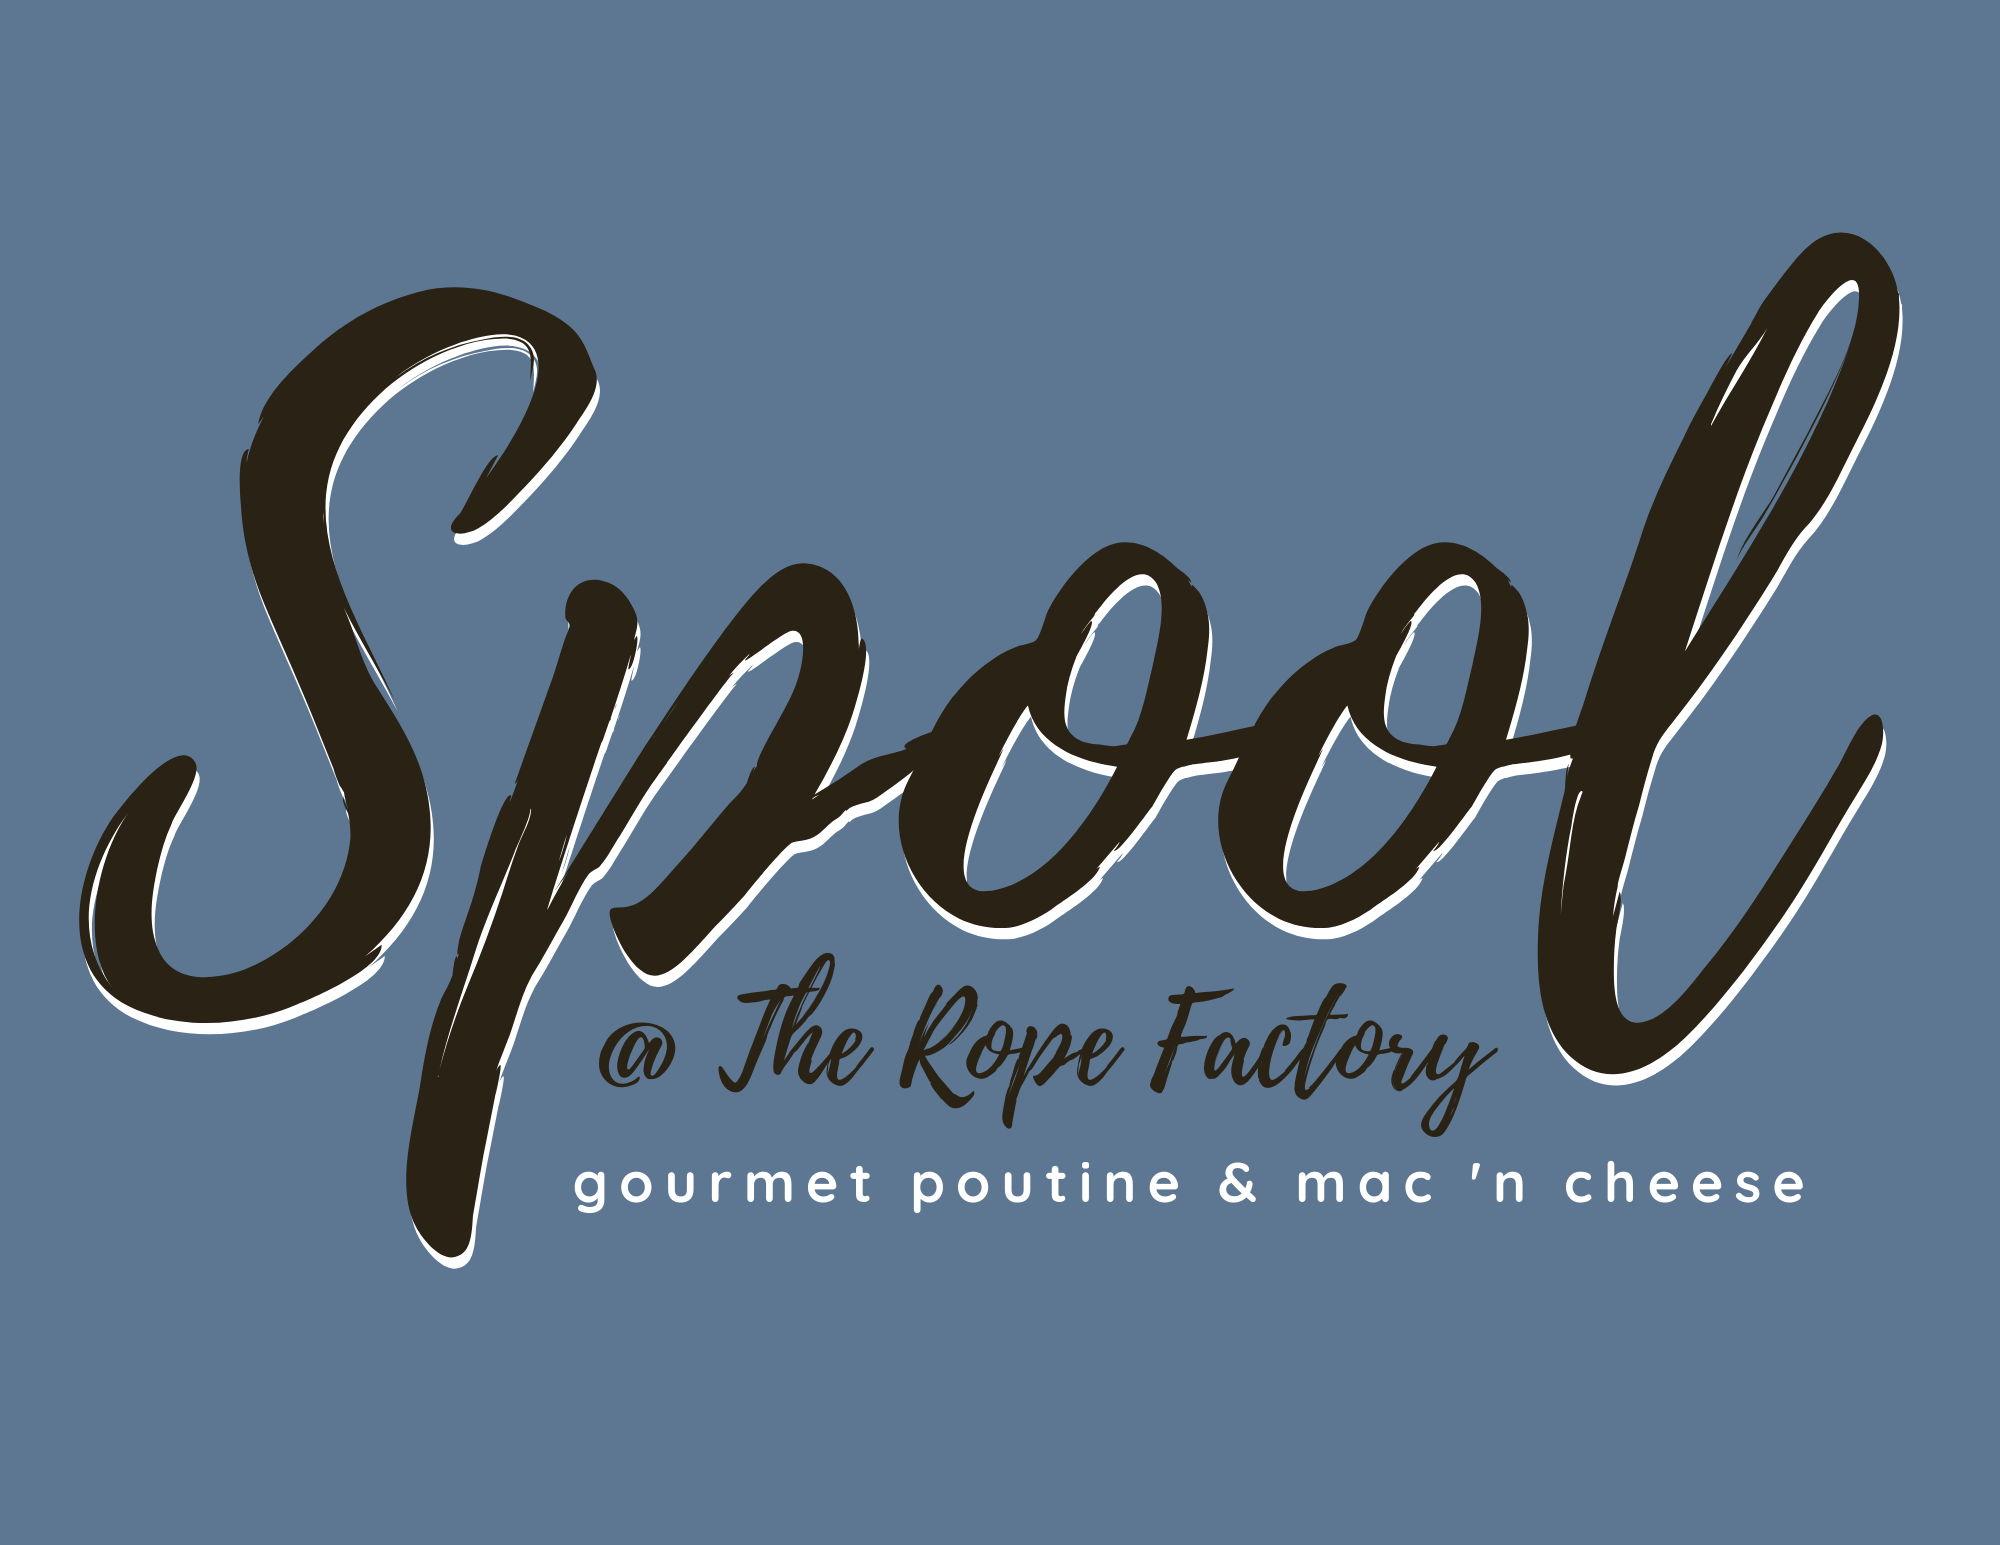 Logo - Spool @ The Rope Factory - Gourmet Poutine & Mac 'N Cheese